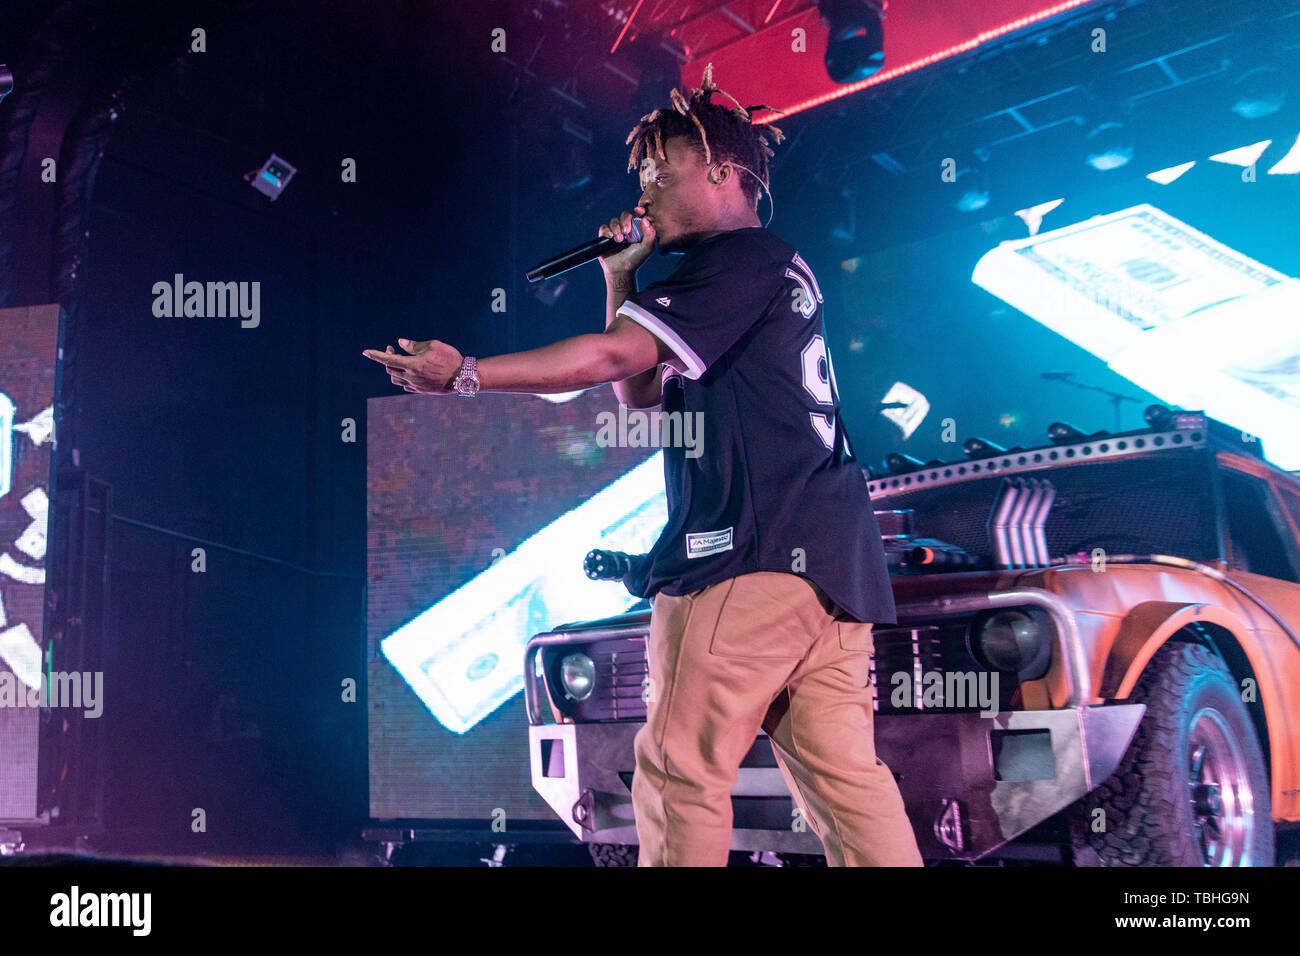 May 31, 2019 - Milwaukee, Wisconsin, U S - Rapper JUICE WRLD (JARED